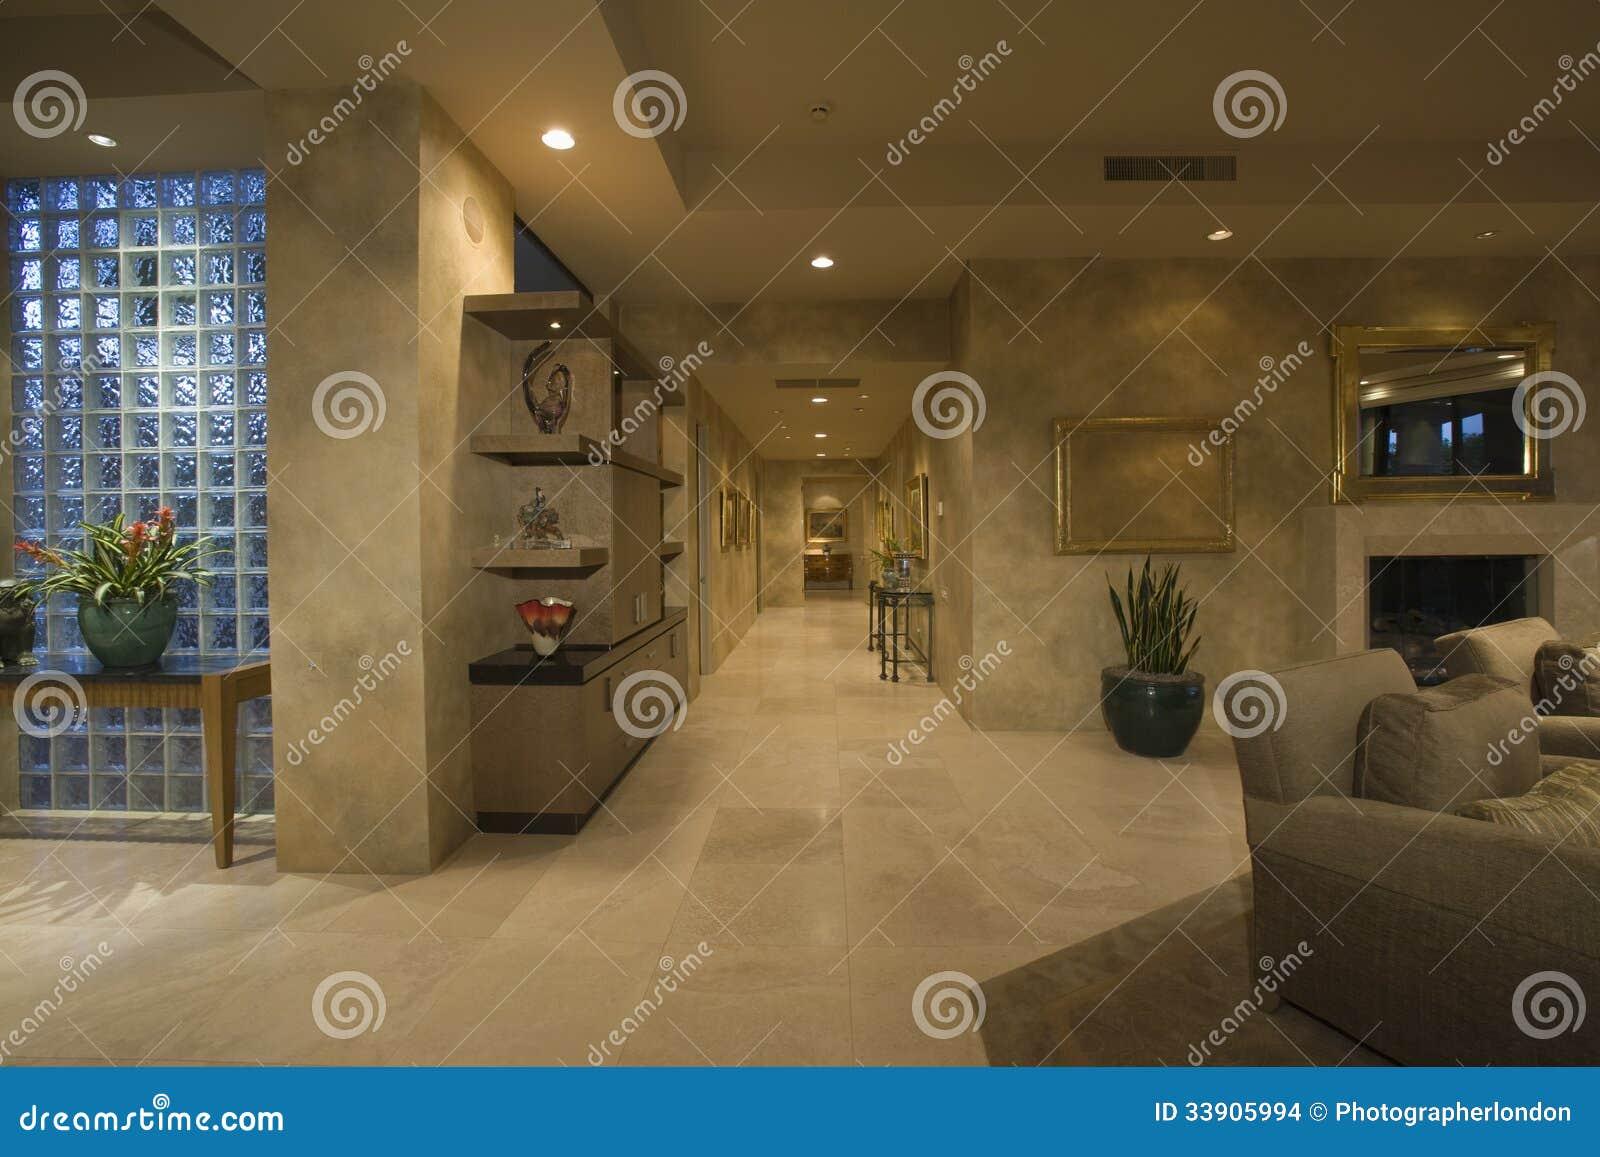 Marmor d ckat hall l ngs hus arkivbilder bild 33905994 - Gang huis ...